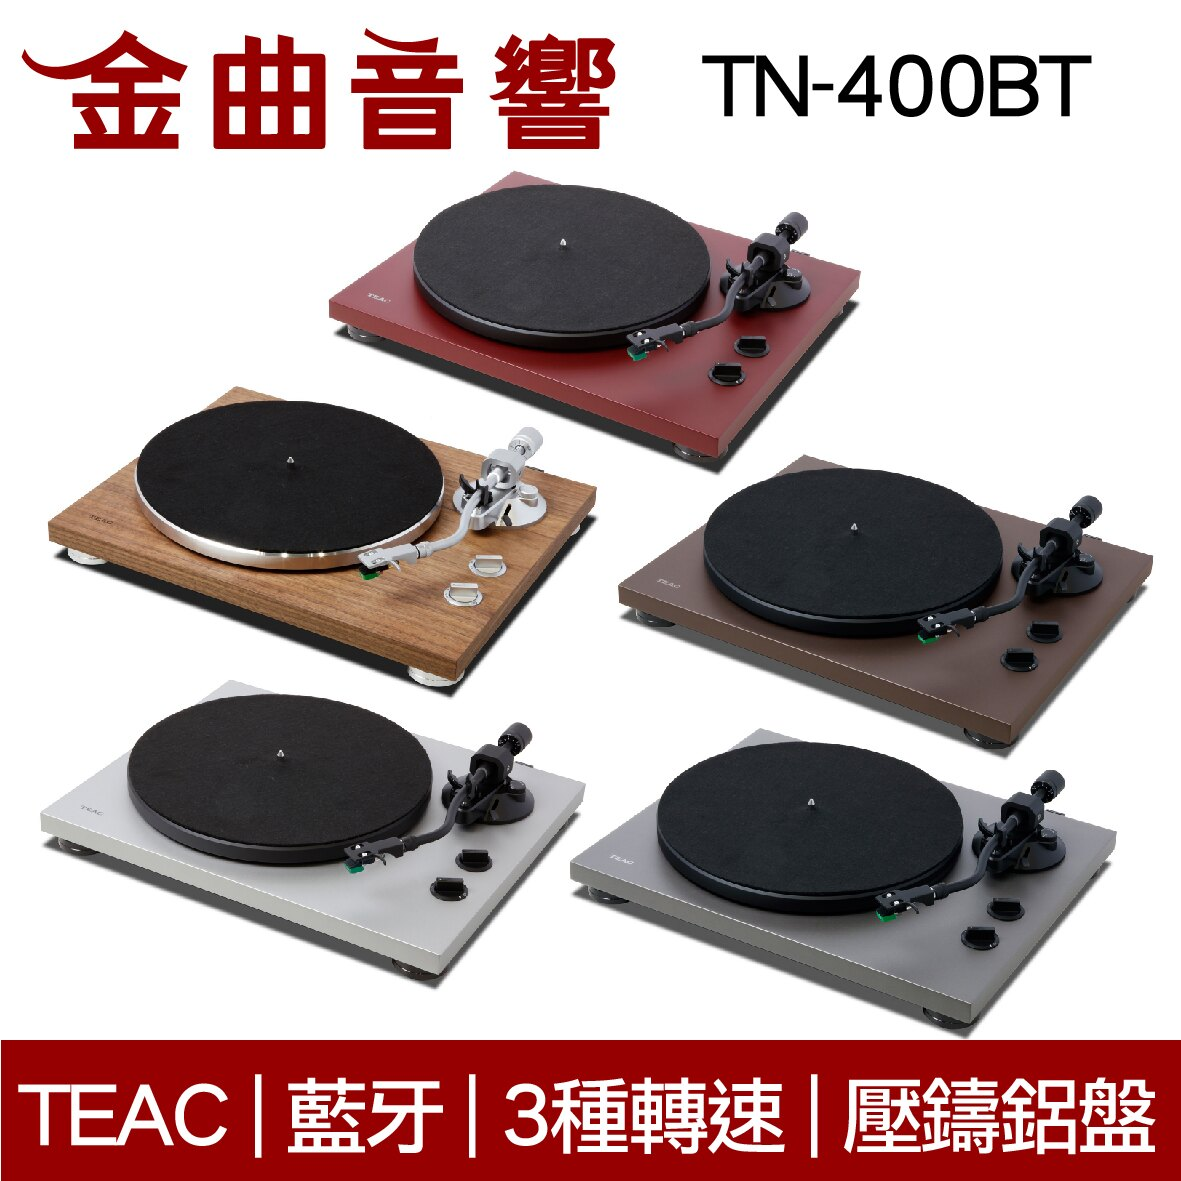 TEAC TN-400BT 胡桃木 藍牙 黑膠 類比 唱盤 | 金曲音響